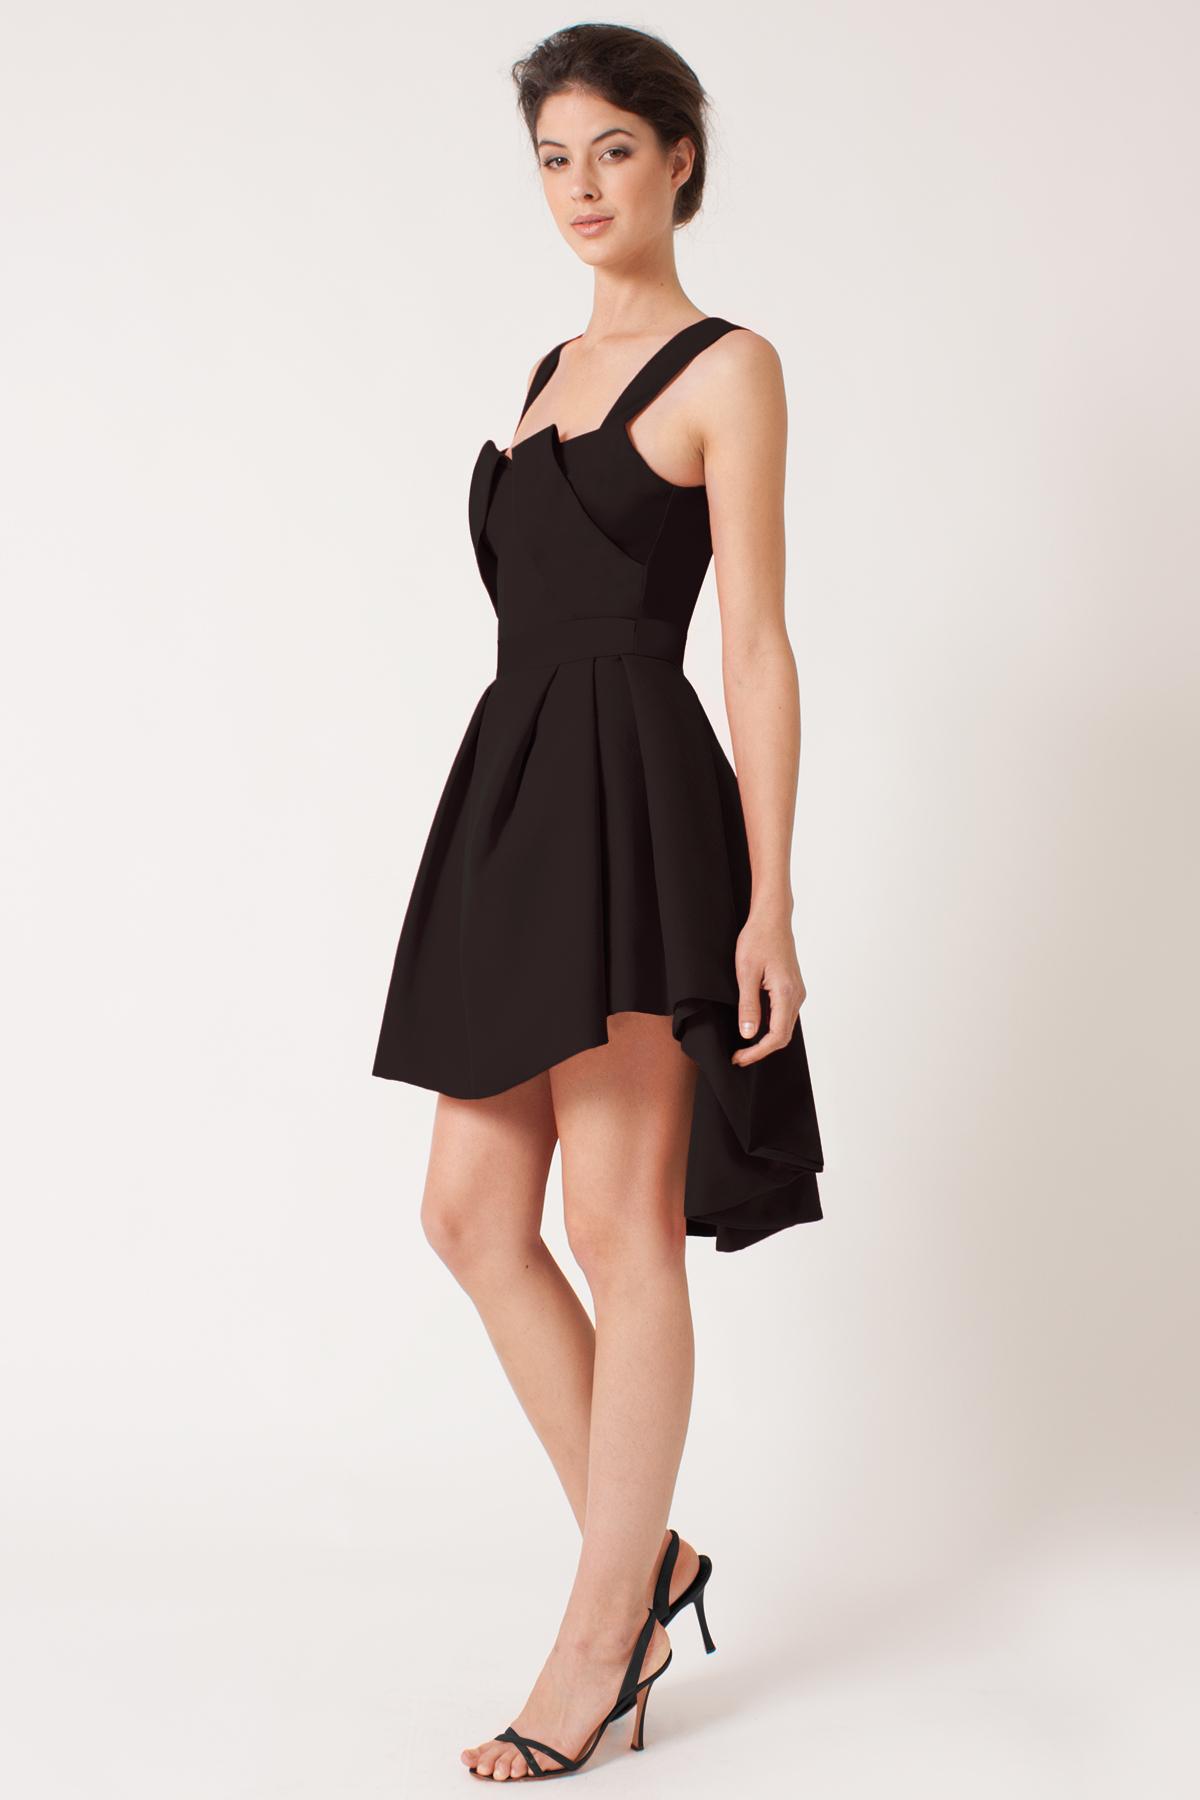 best 25 low cut dresses ideas on pinterest   flirty